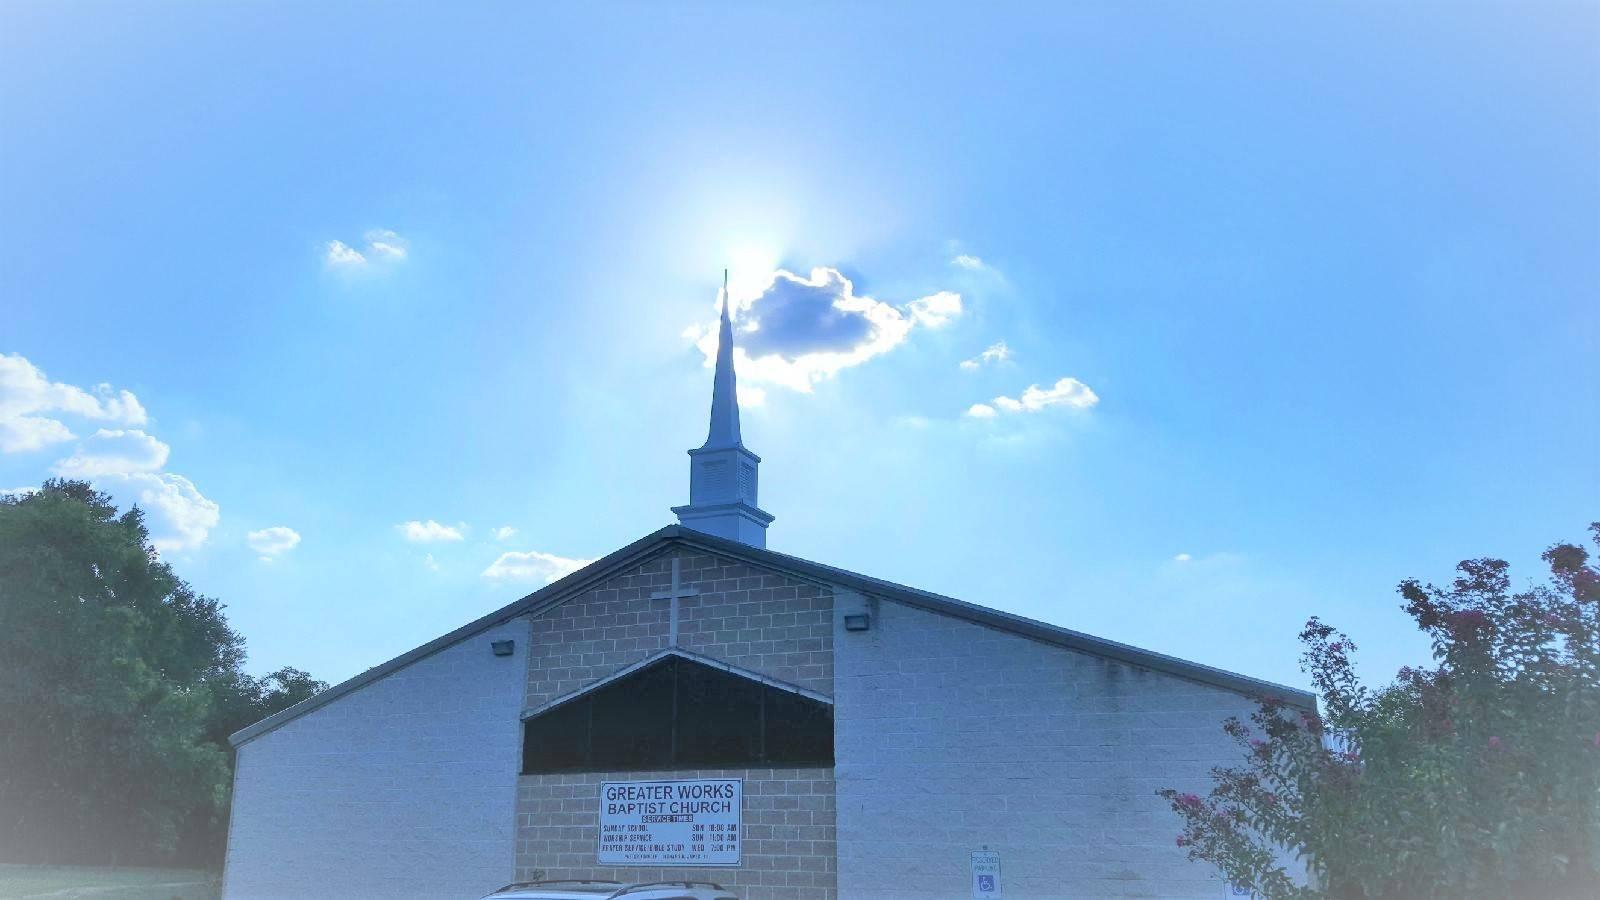 Greater Works Baptist Church, 4000 Tannehill Lane, Austin, TX, 78721, United States